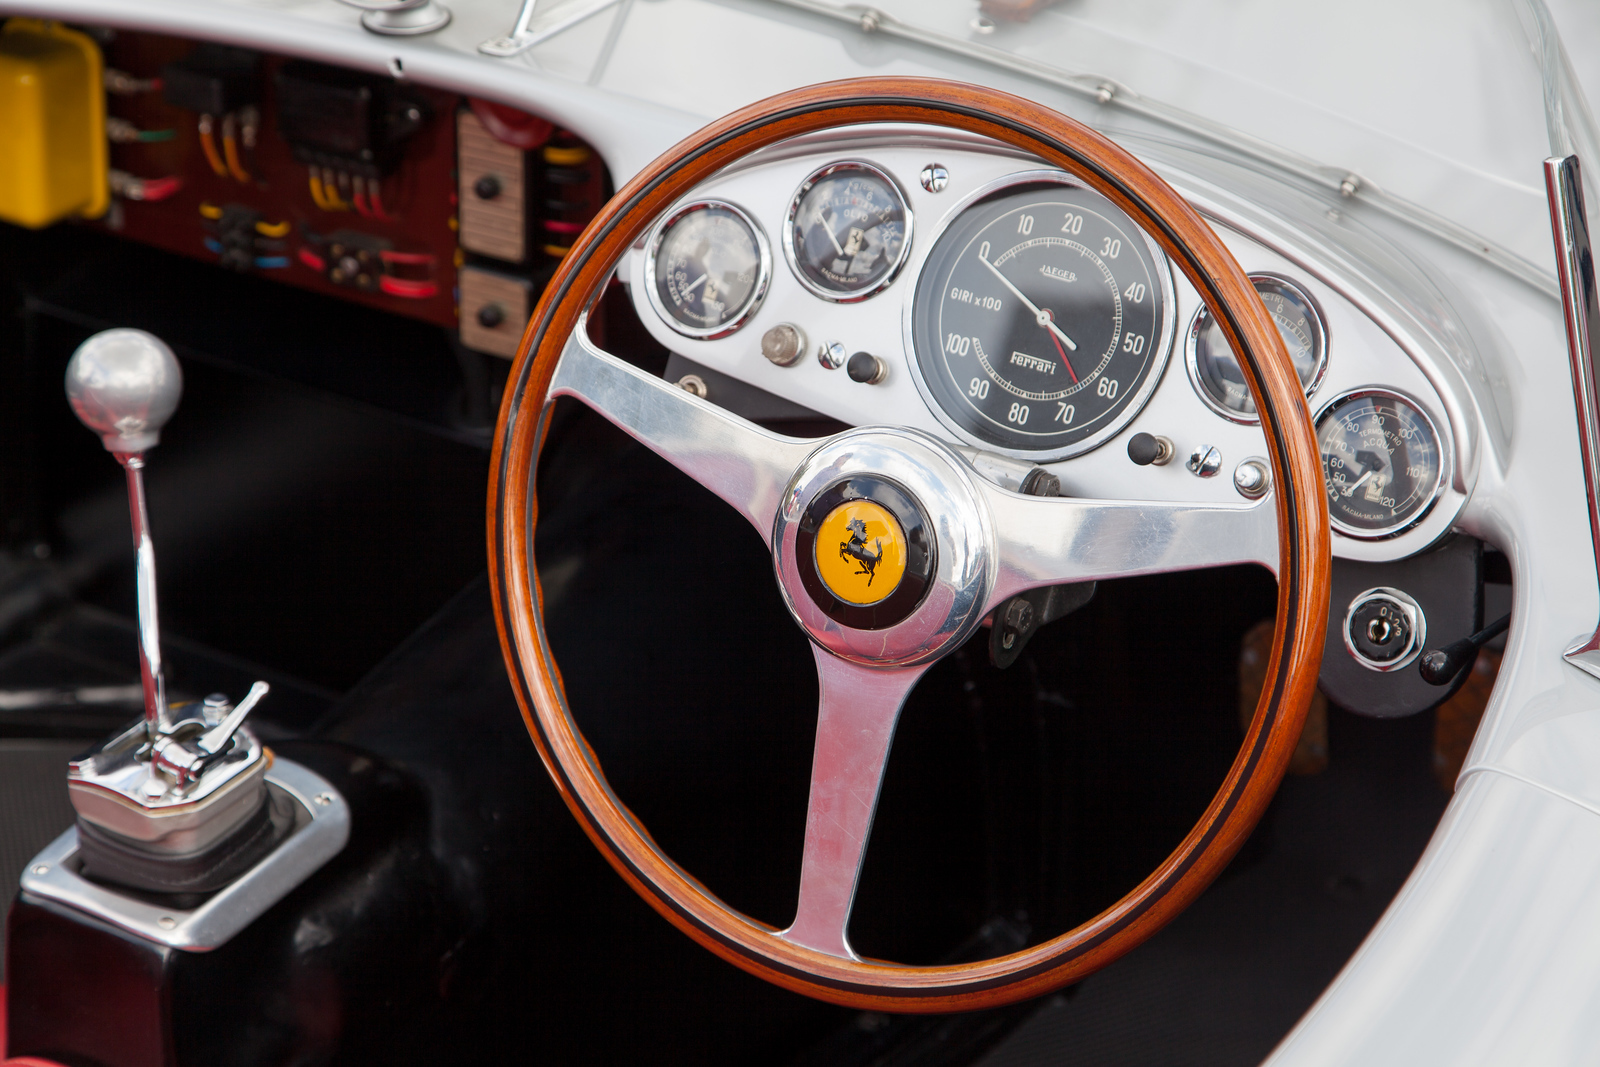 1957 Ferrari 625/250 TRC, owned by Bruce Meyer